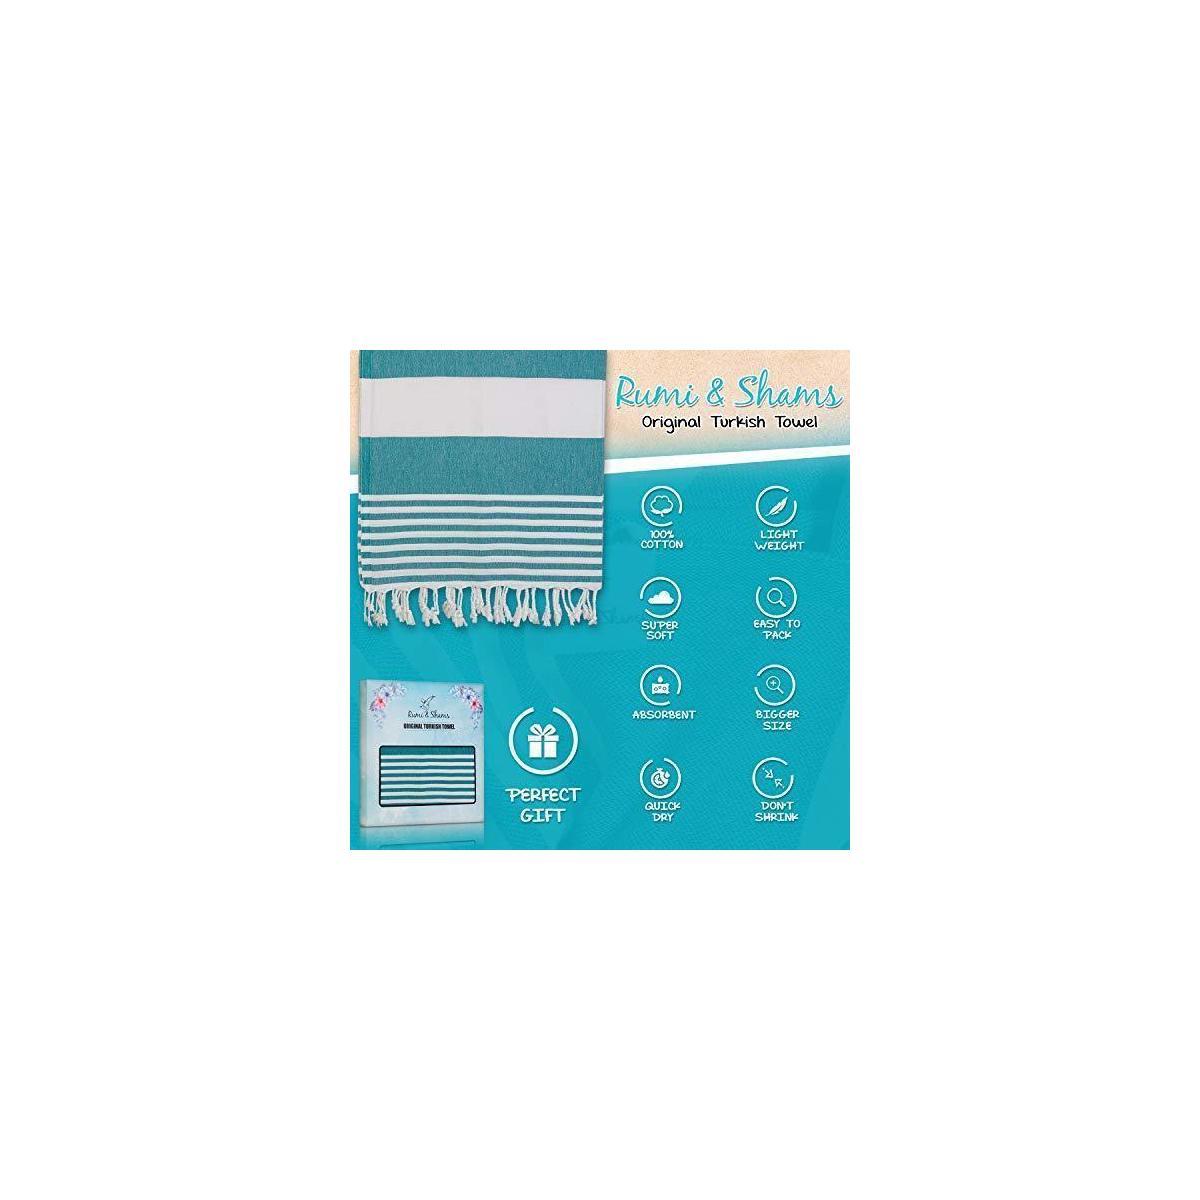 Rumi&Shams Turkish Beach Towel 35x71 Jumbo Oversize. 100 Percent Cotton, Lightweight, Highly Absorbent, Quick Dry, Prewashed Peshtemal. Makes a Soft Blanket, Yoga Mat, Bath Towel